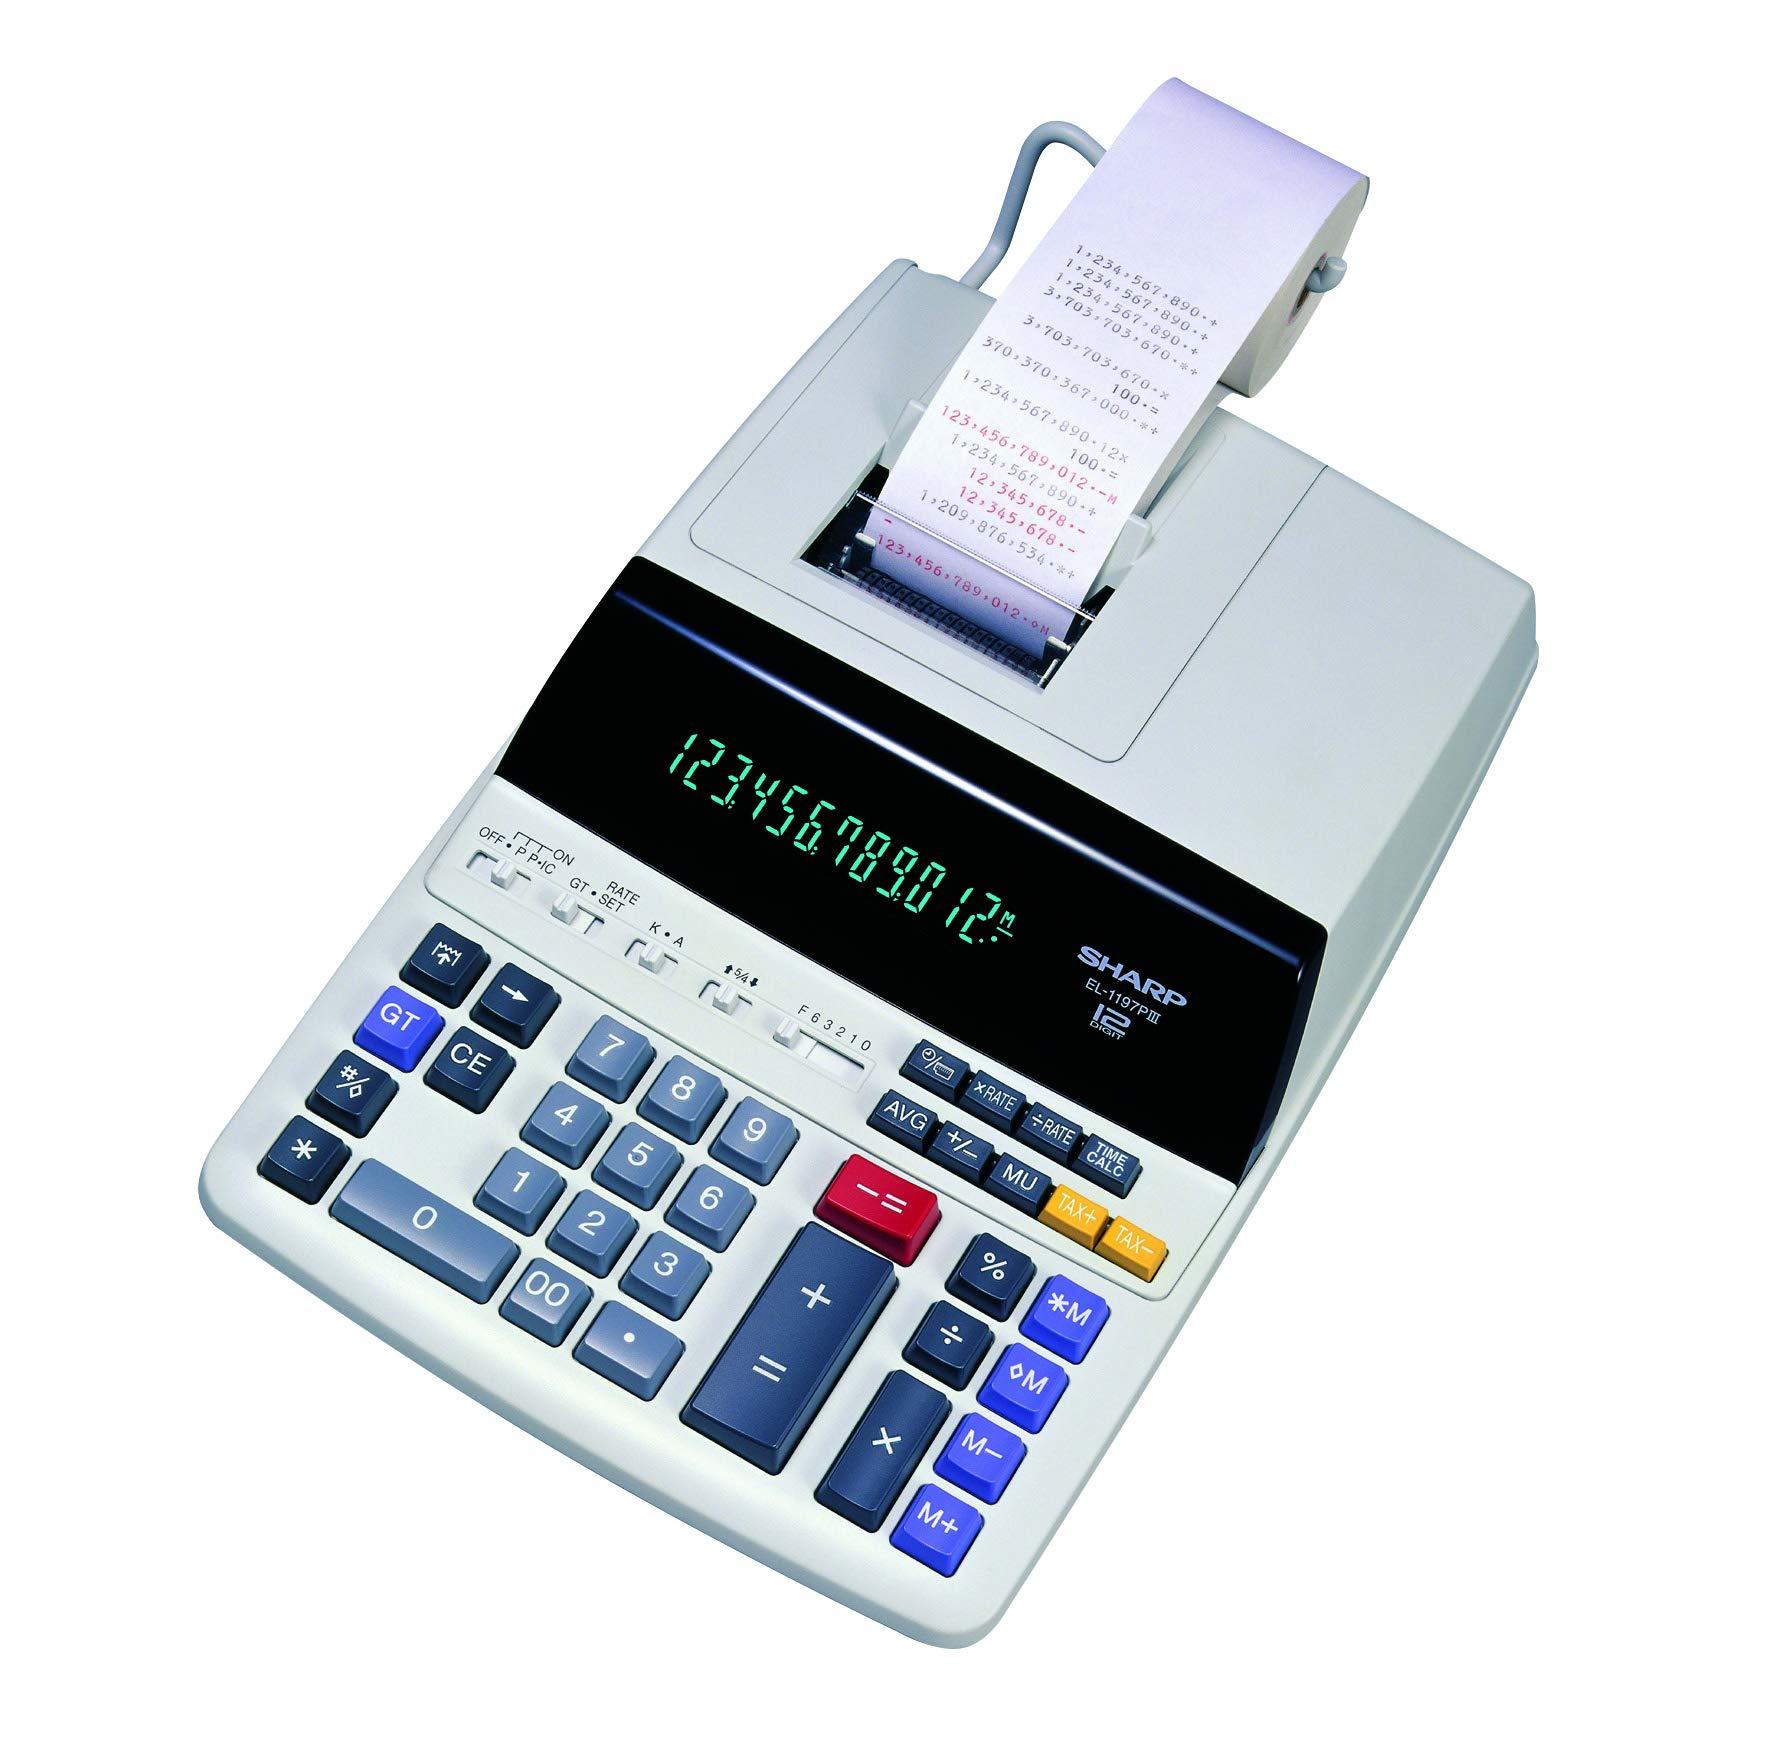 Sharp EL-1197PIII Heavy Duty Color Printing Calculator with Clock and Calendar by Sharp